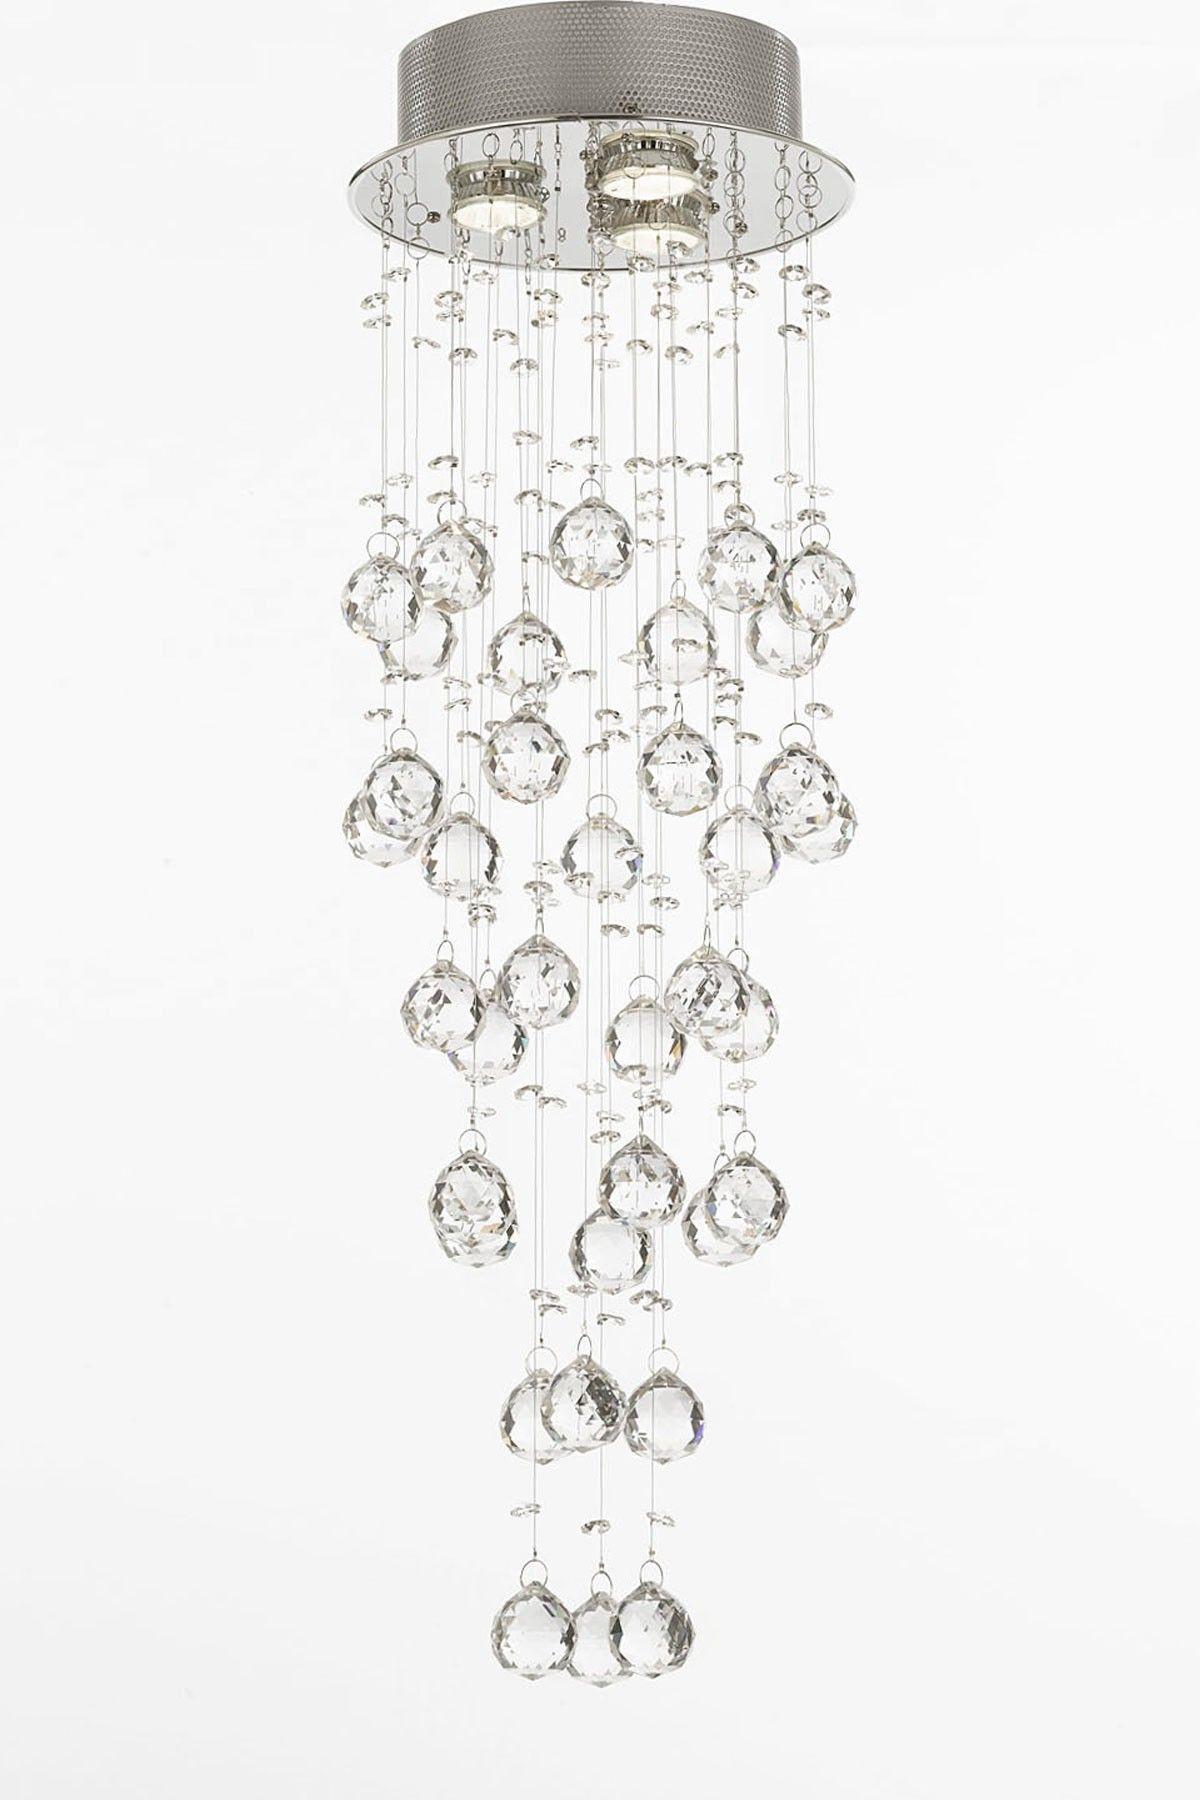 Modern crystal raindrop chandelier light fixture for bathroom